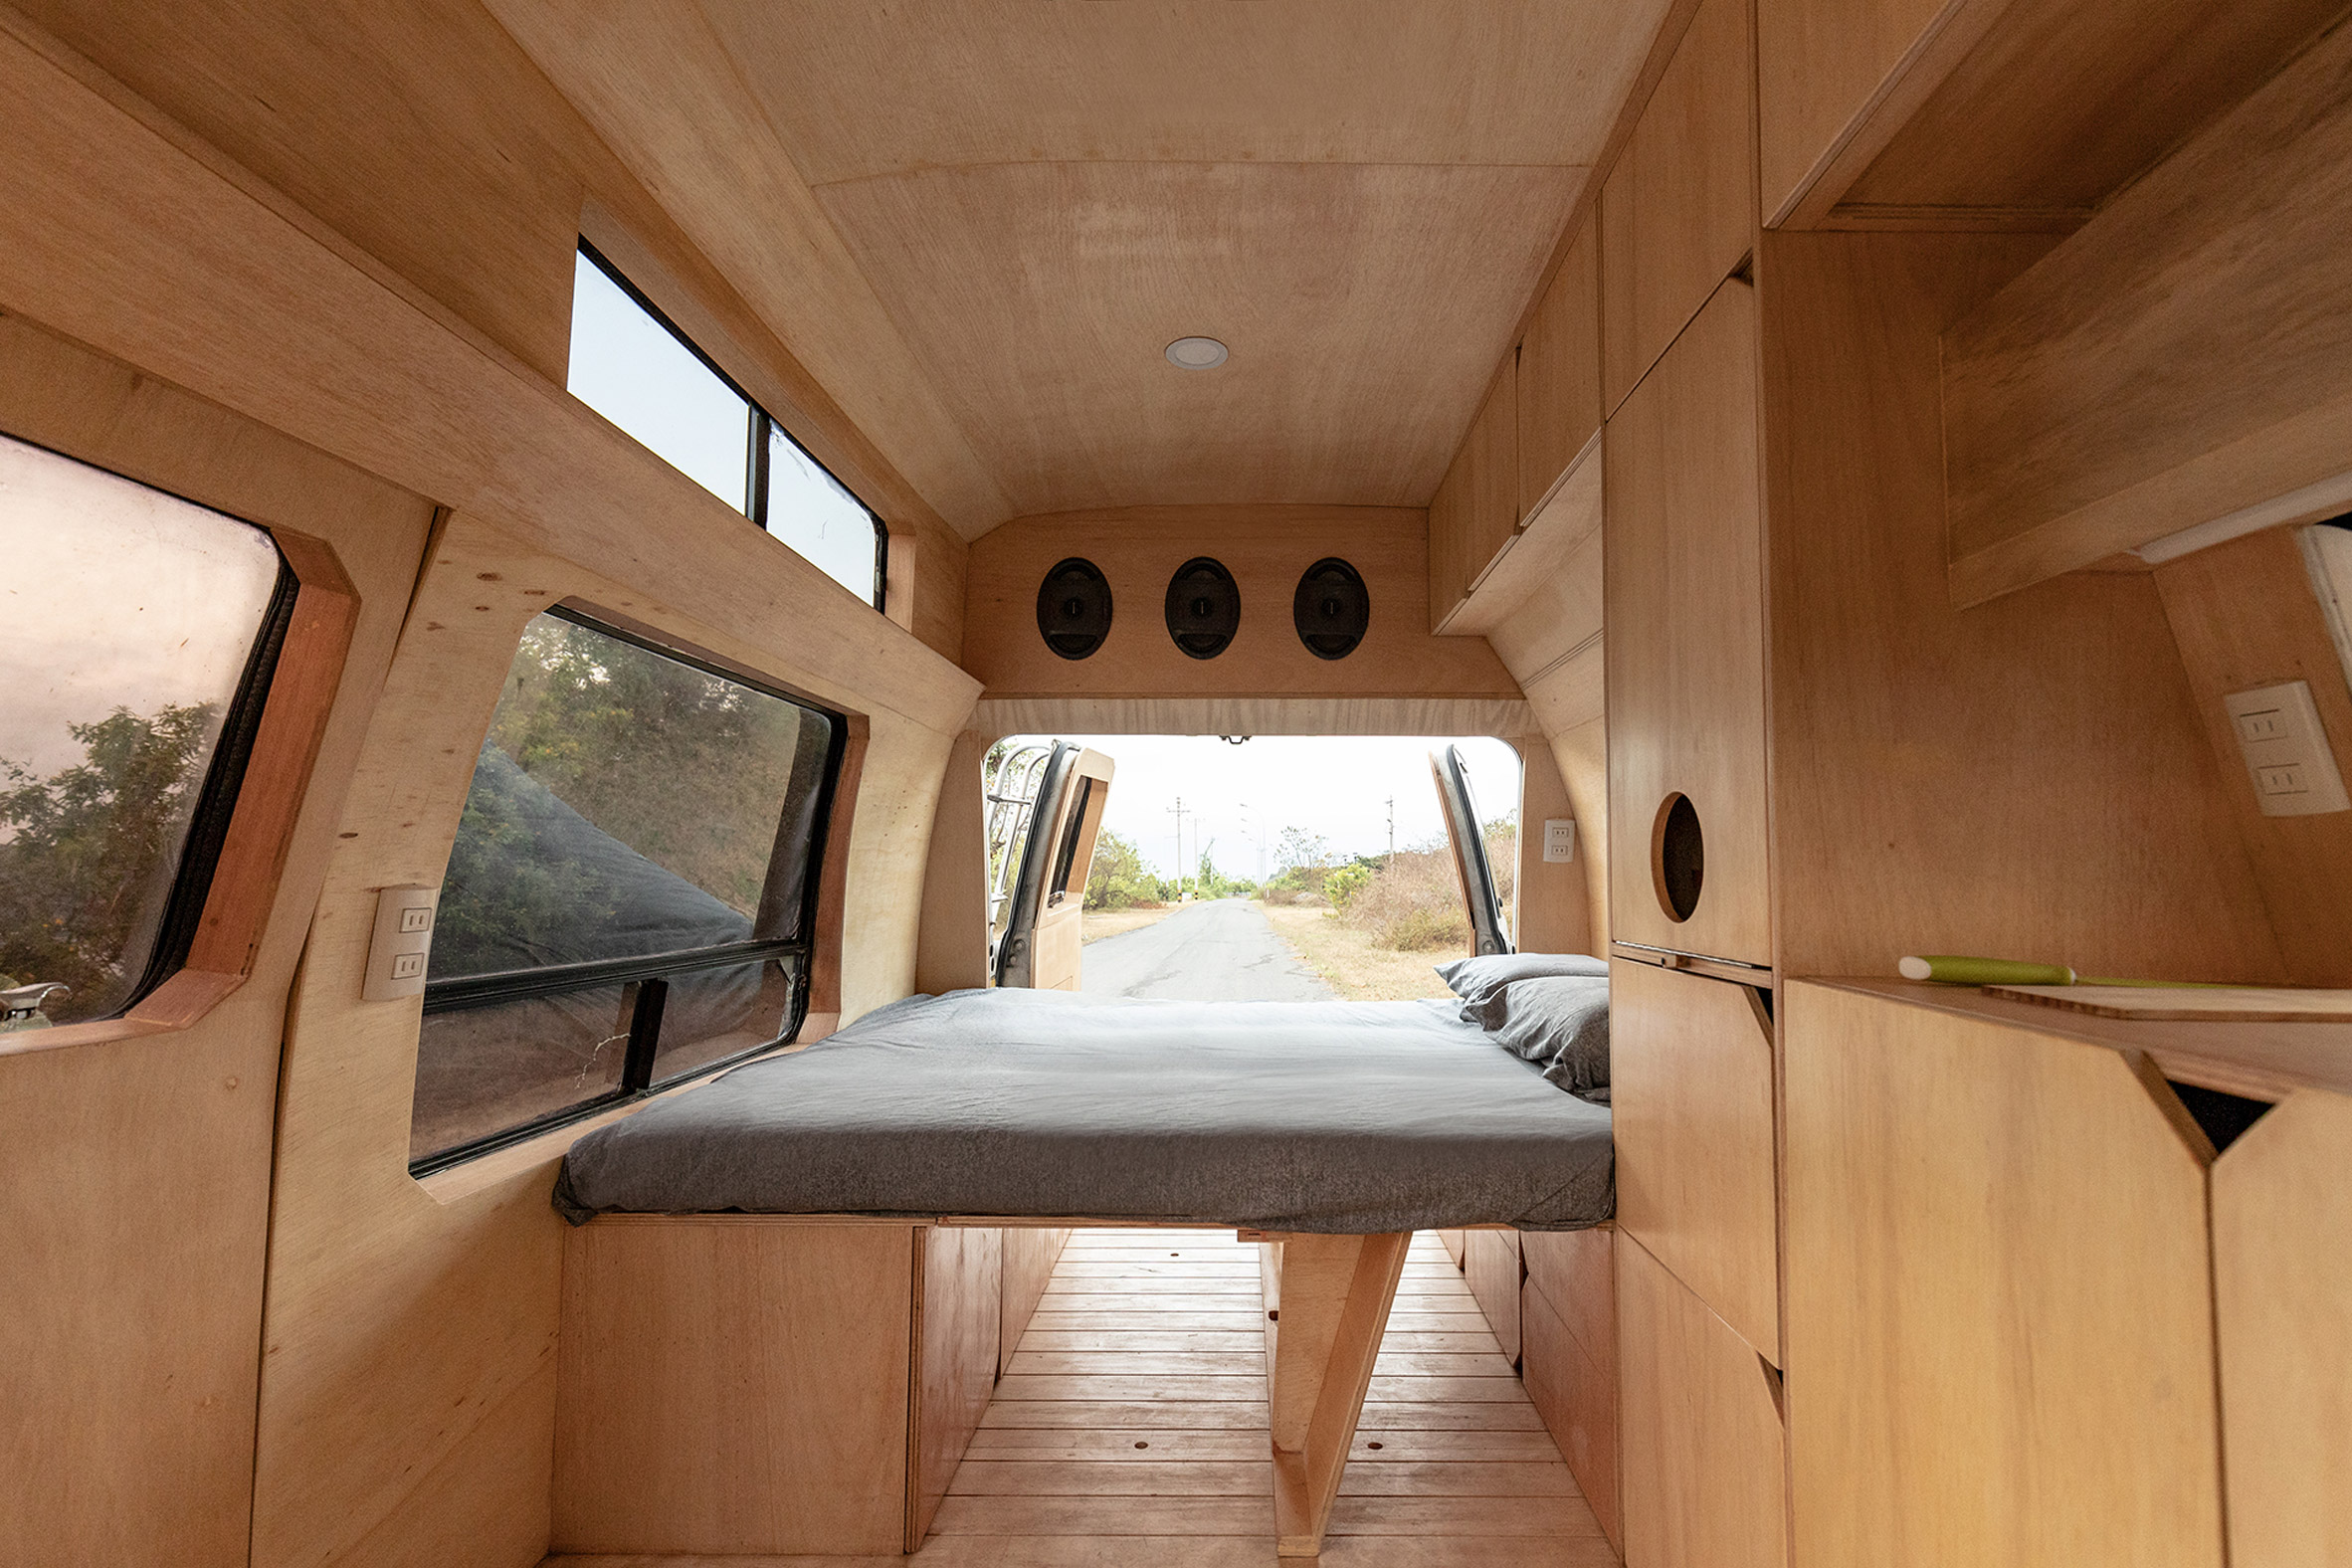 A grey mattress inside a mobile home